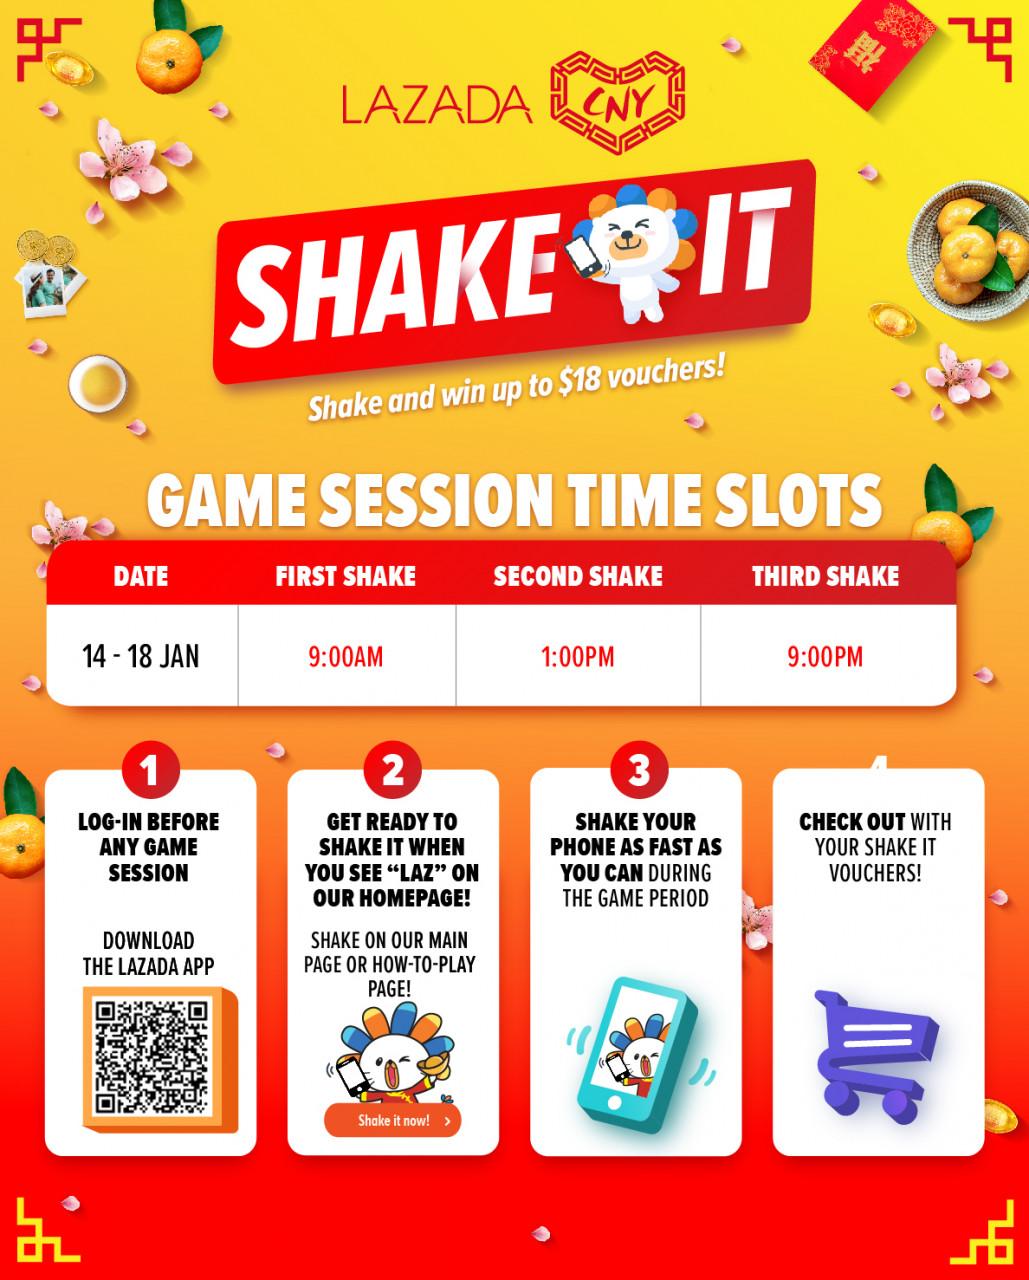 lazada shake it deal 2019 promo code